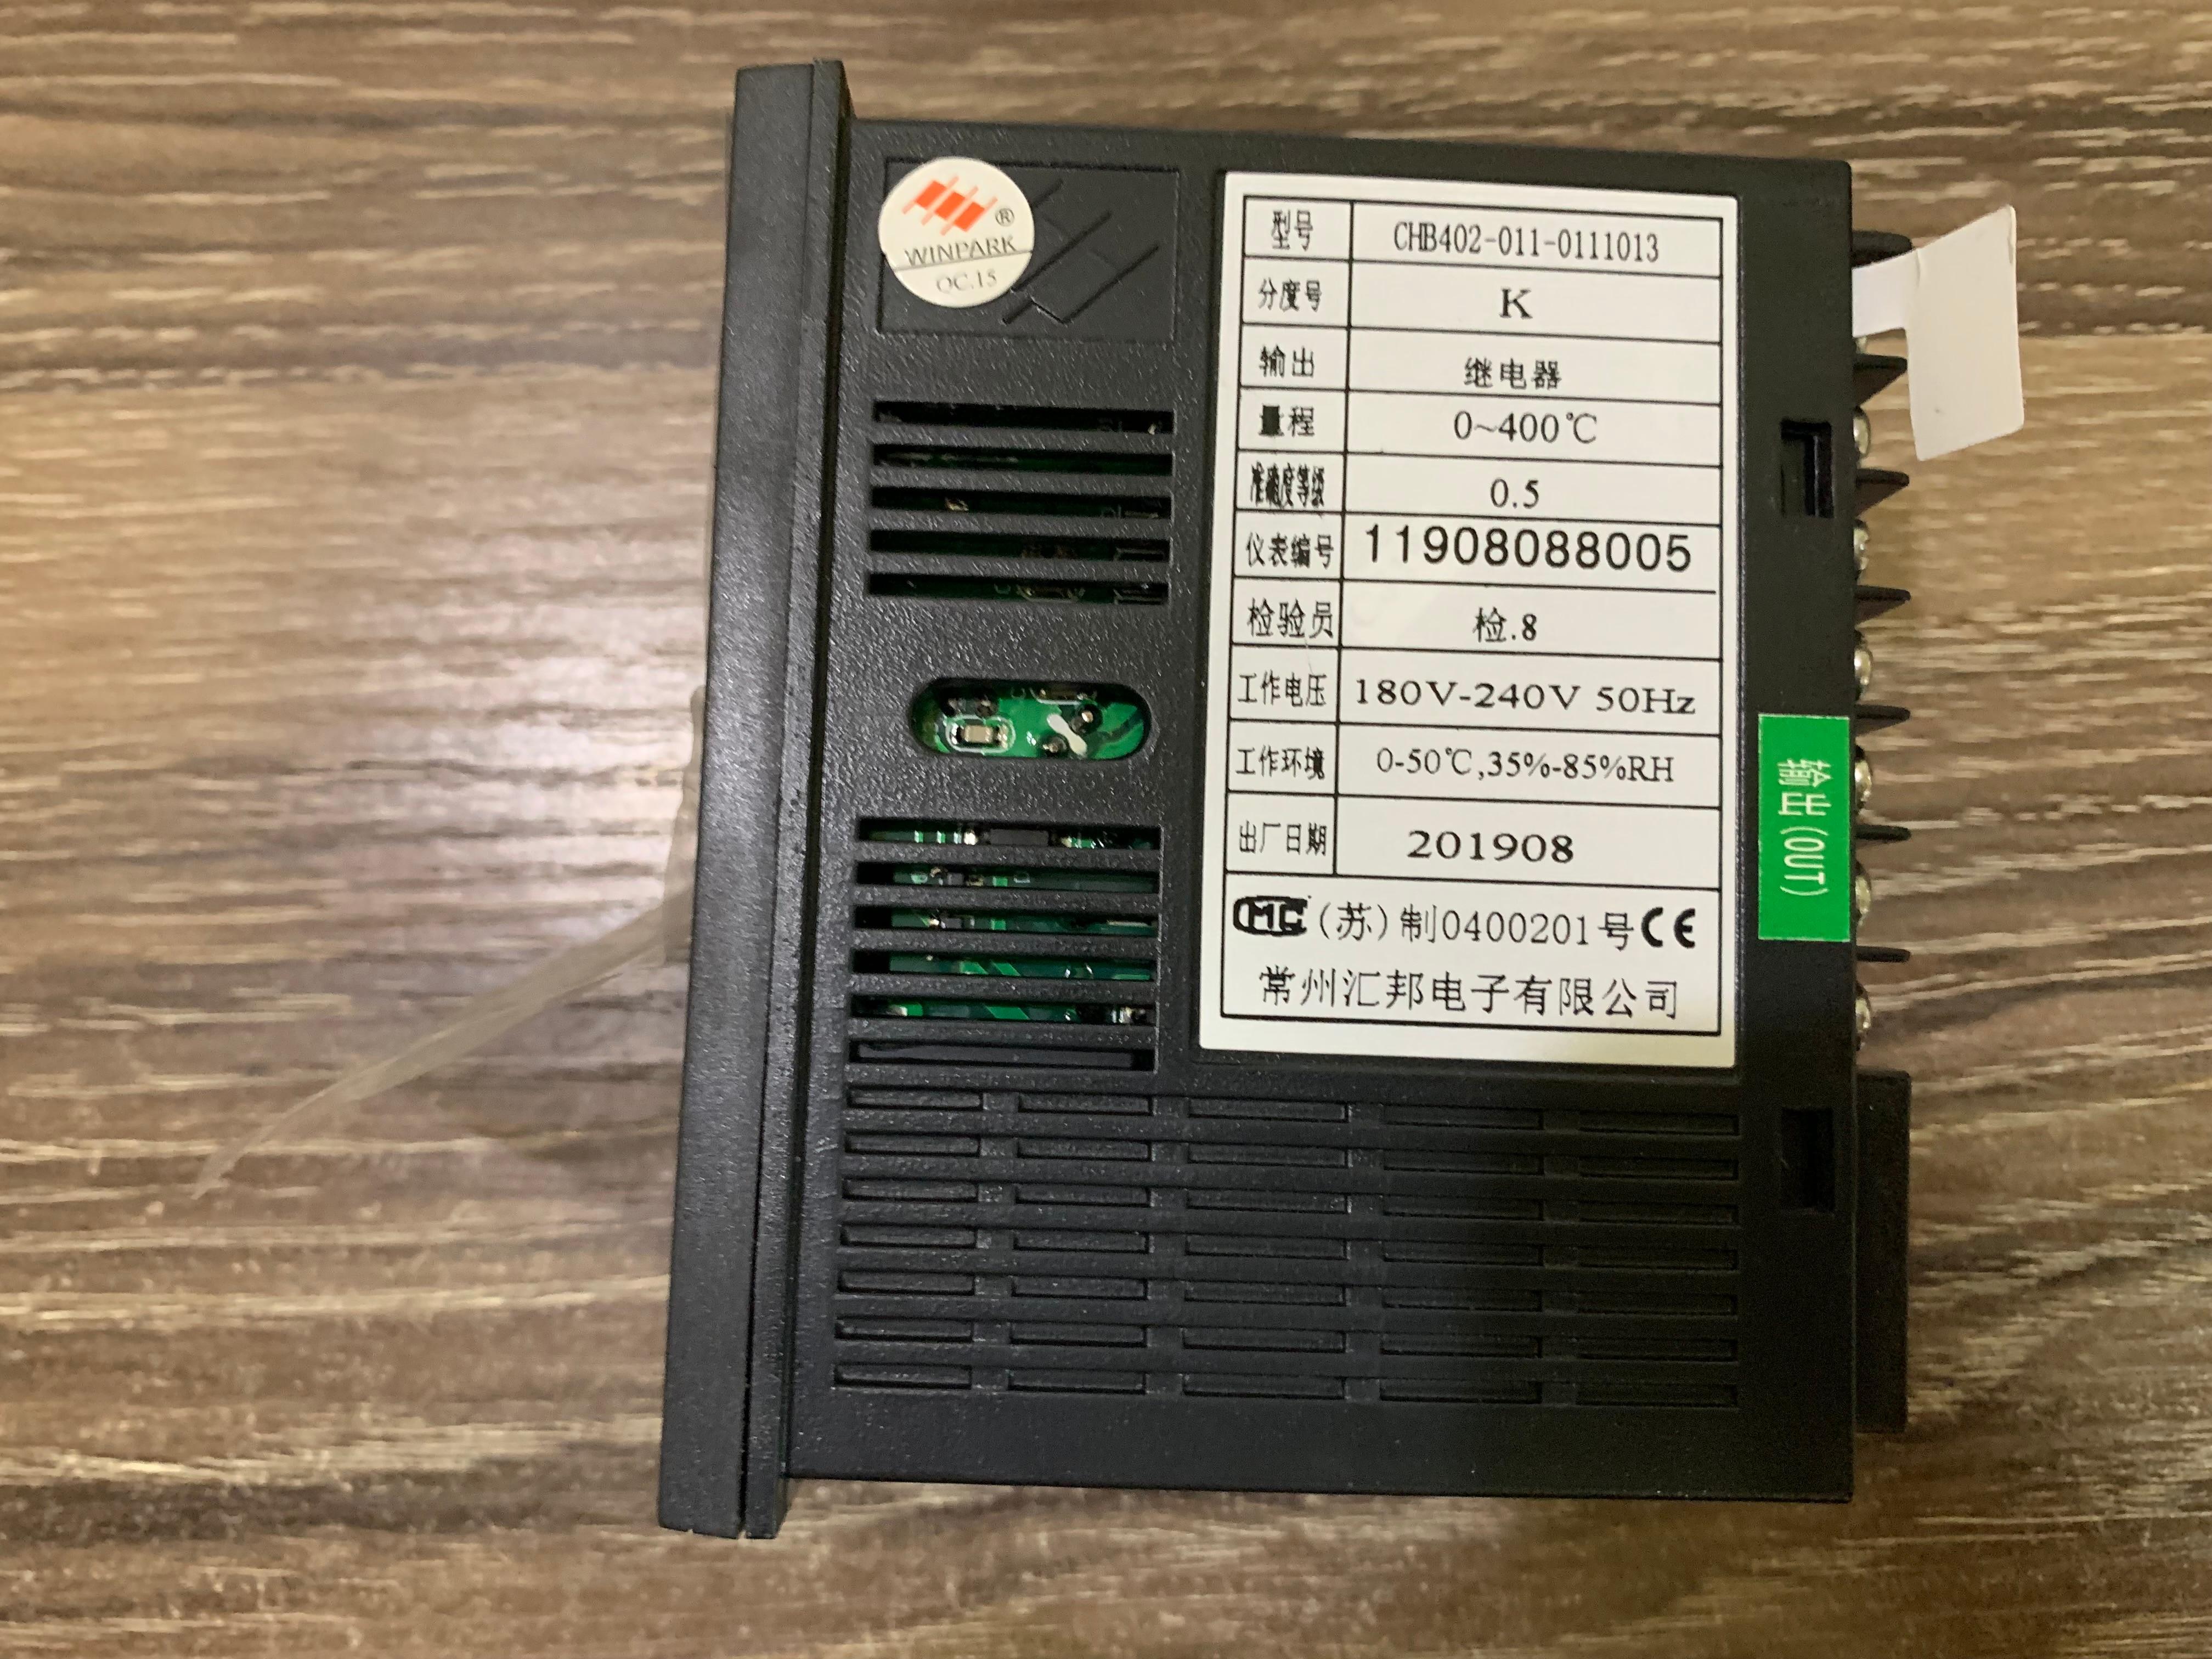 ترموستات هوشمند WINPARK CHB402 Huibang CHB402-011-0111013 اصلی جدید